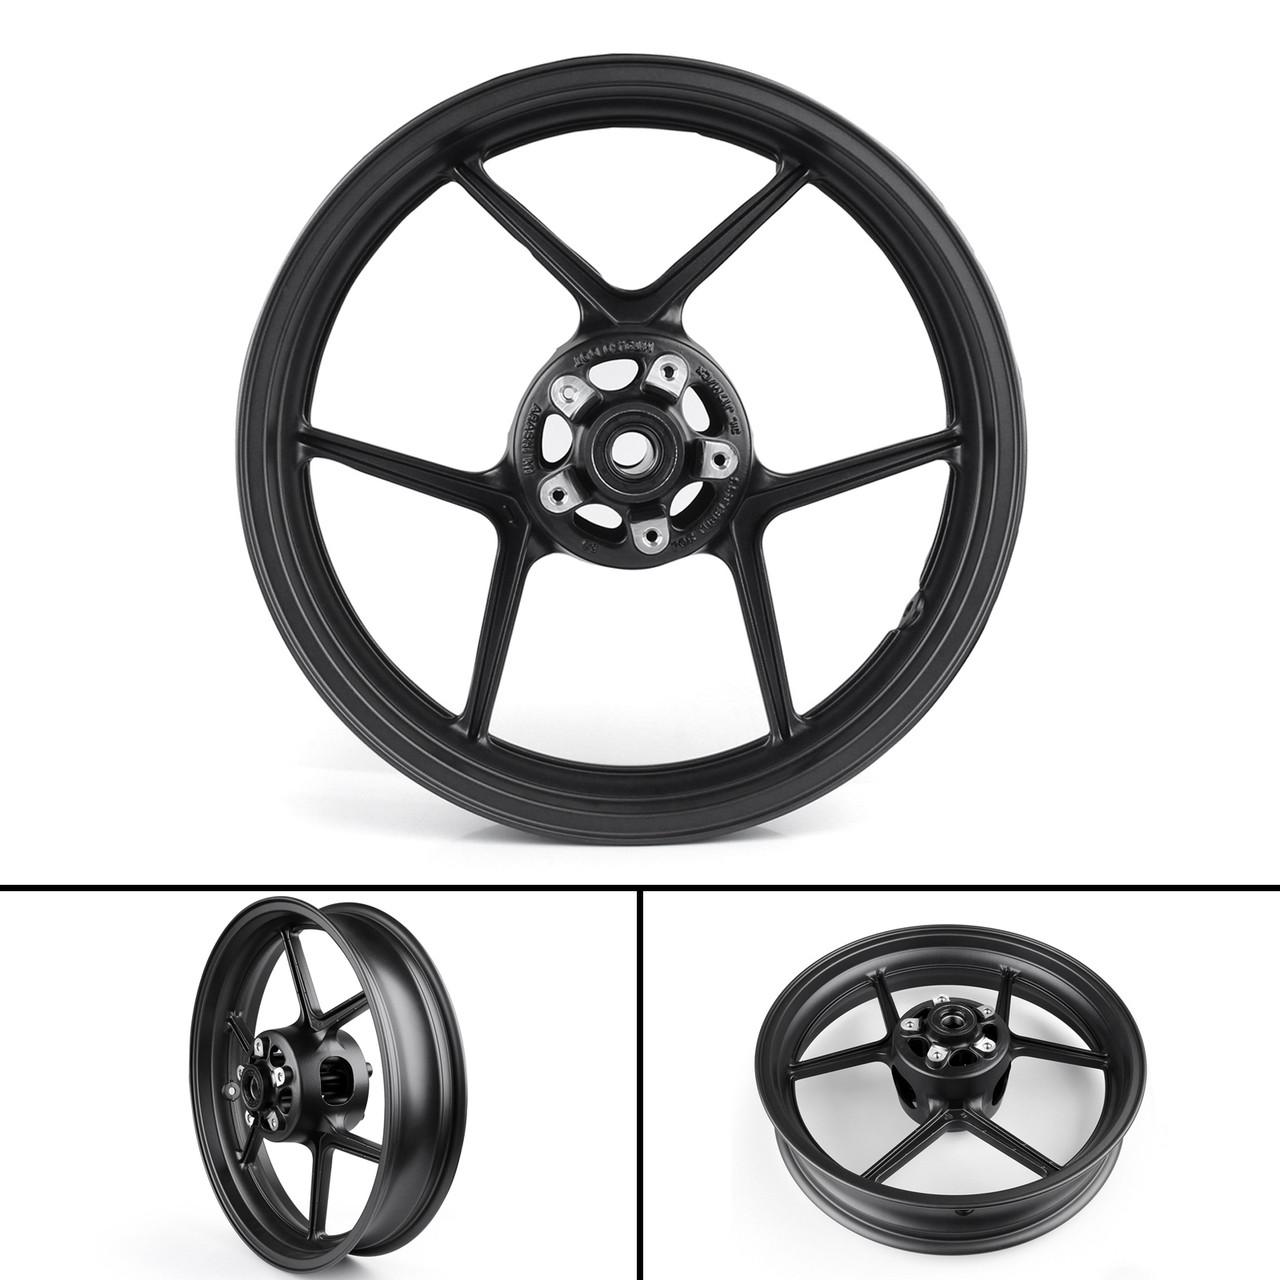 hight resolution of front wheel rim for kawasaki ninja zx6r 2005 2012 zx10r 2006 2010 z750 2007